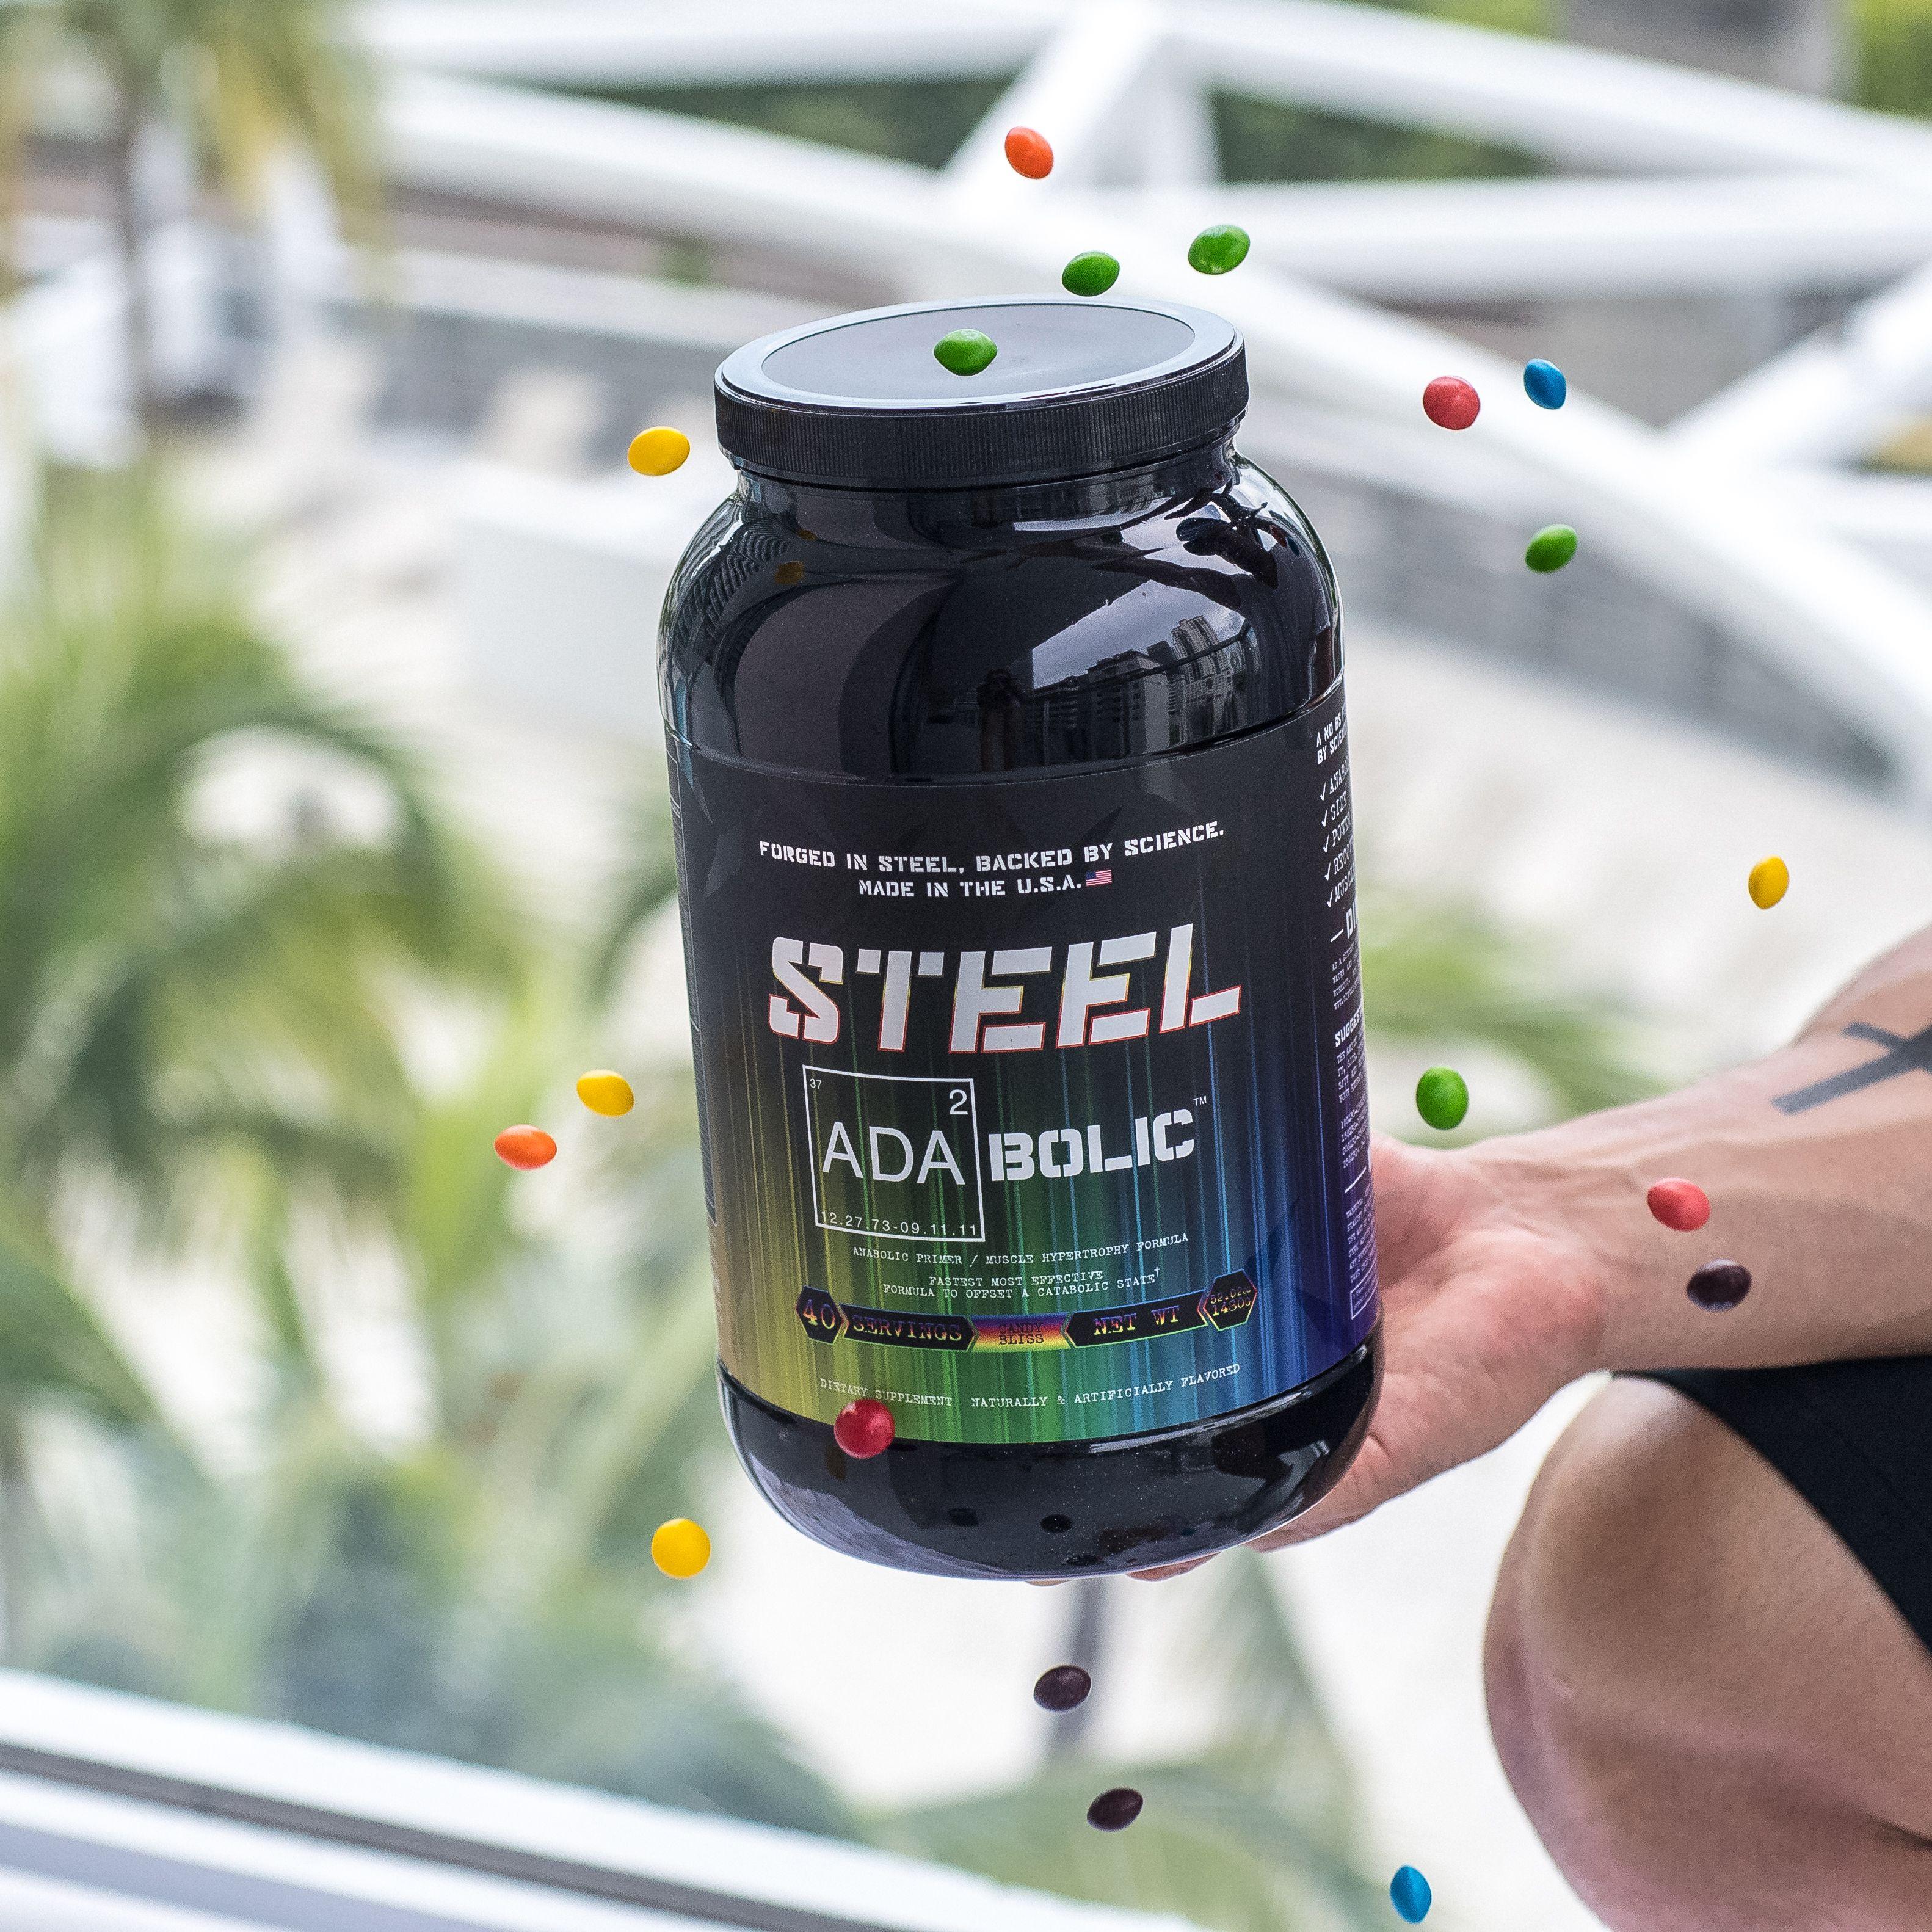 ADABOLIC STEEL Supplements Steel Supplements Workout